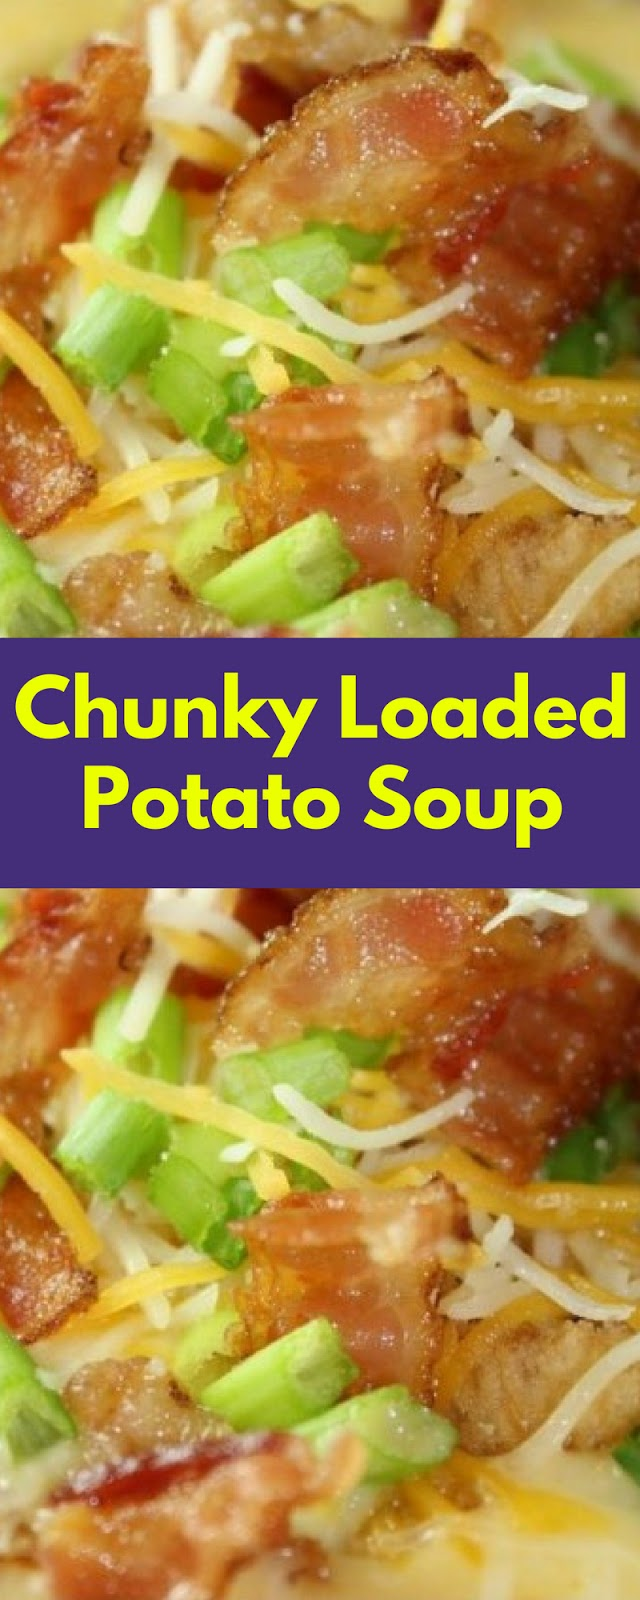 Chunky Loaded Potato Soup